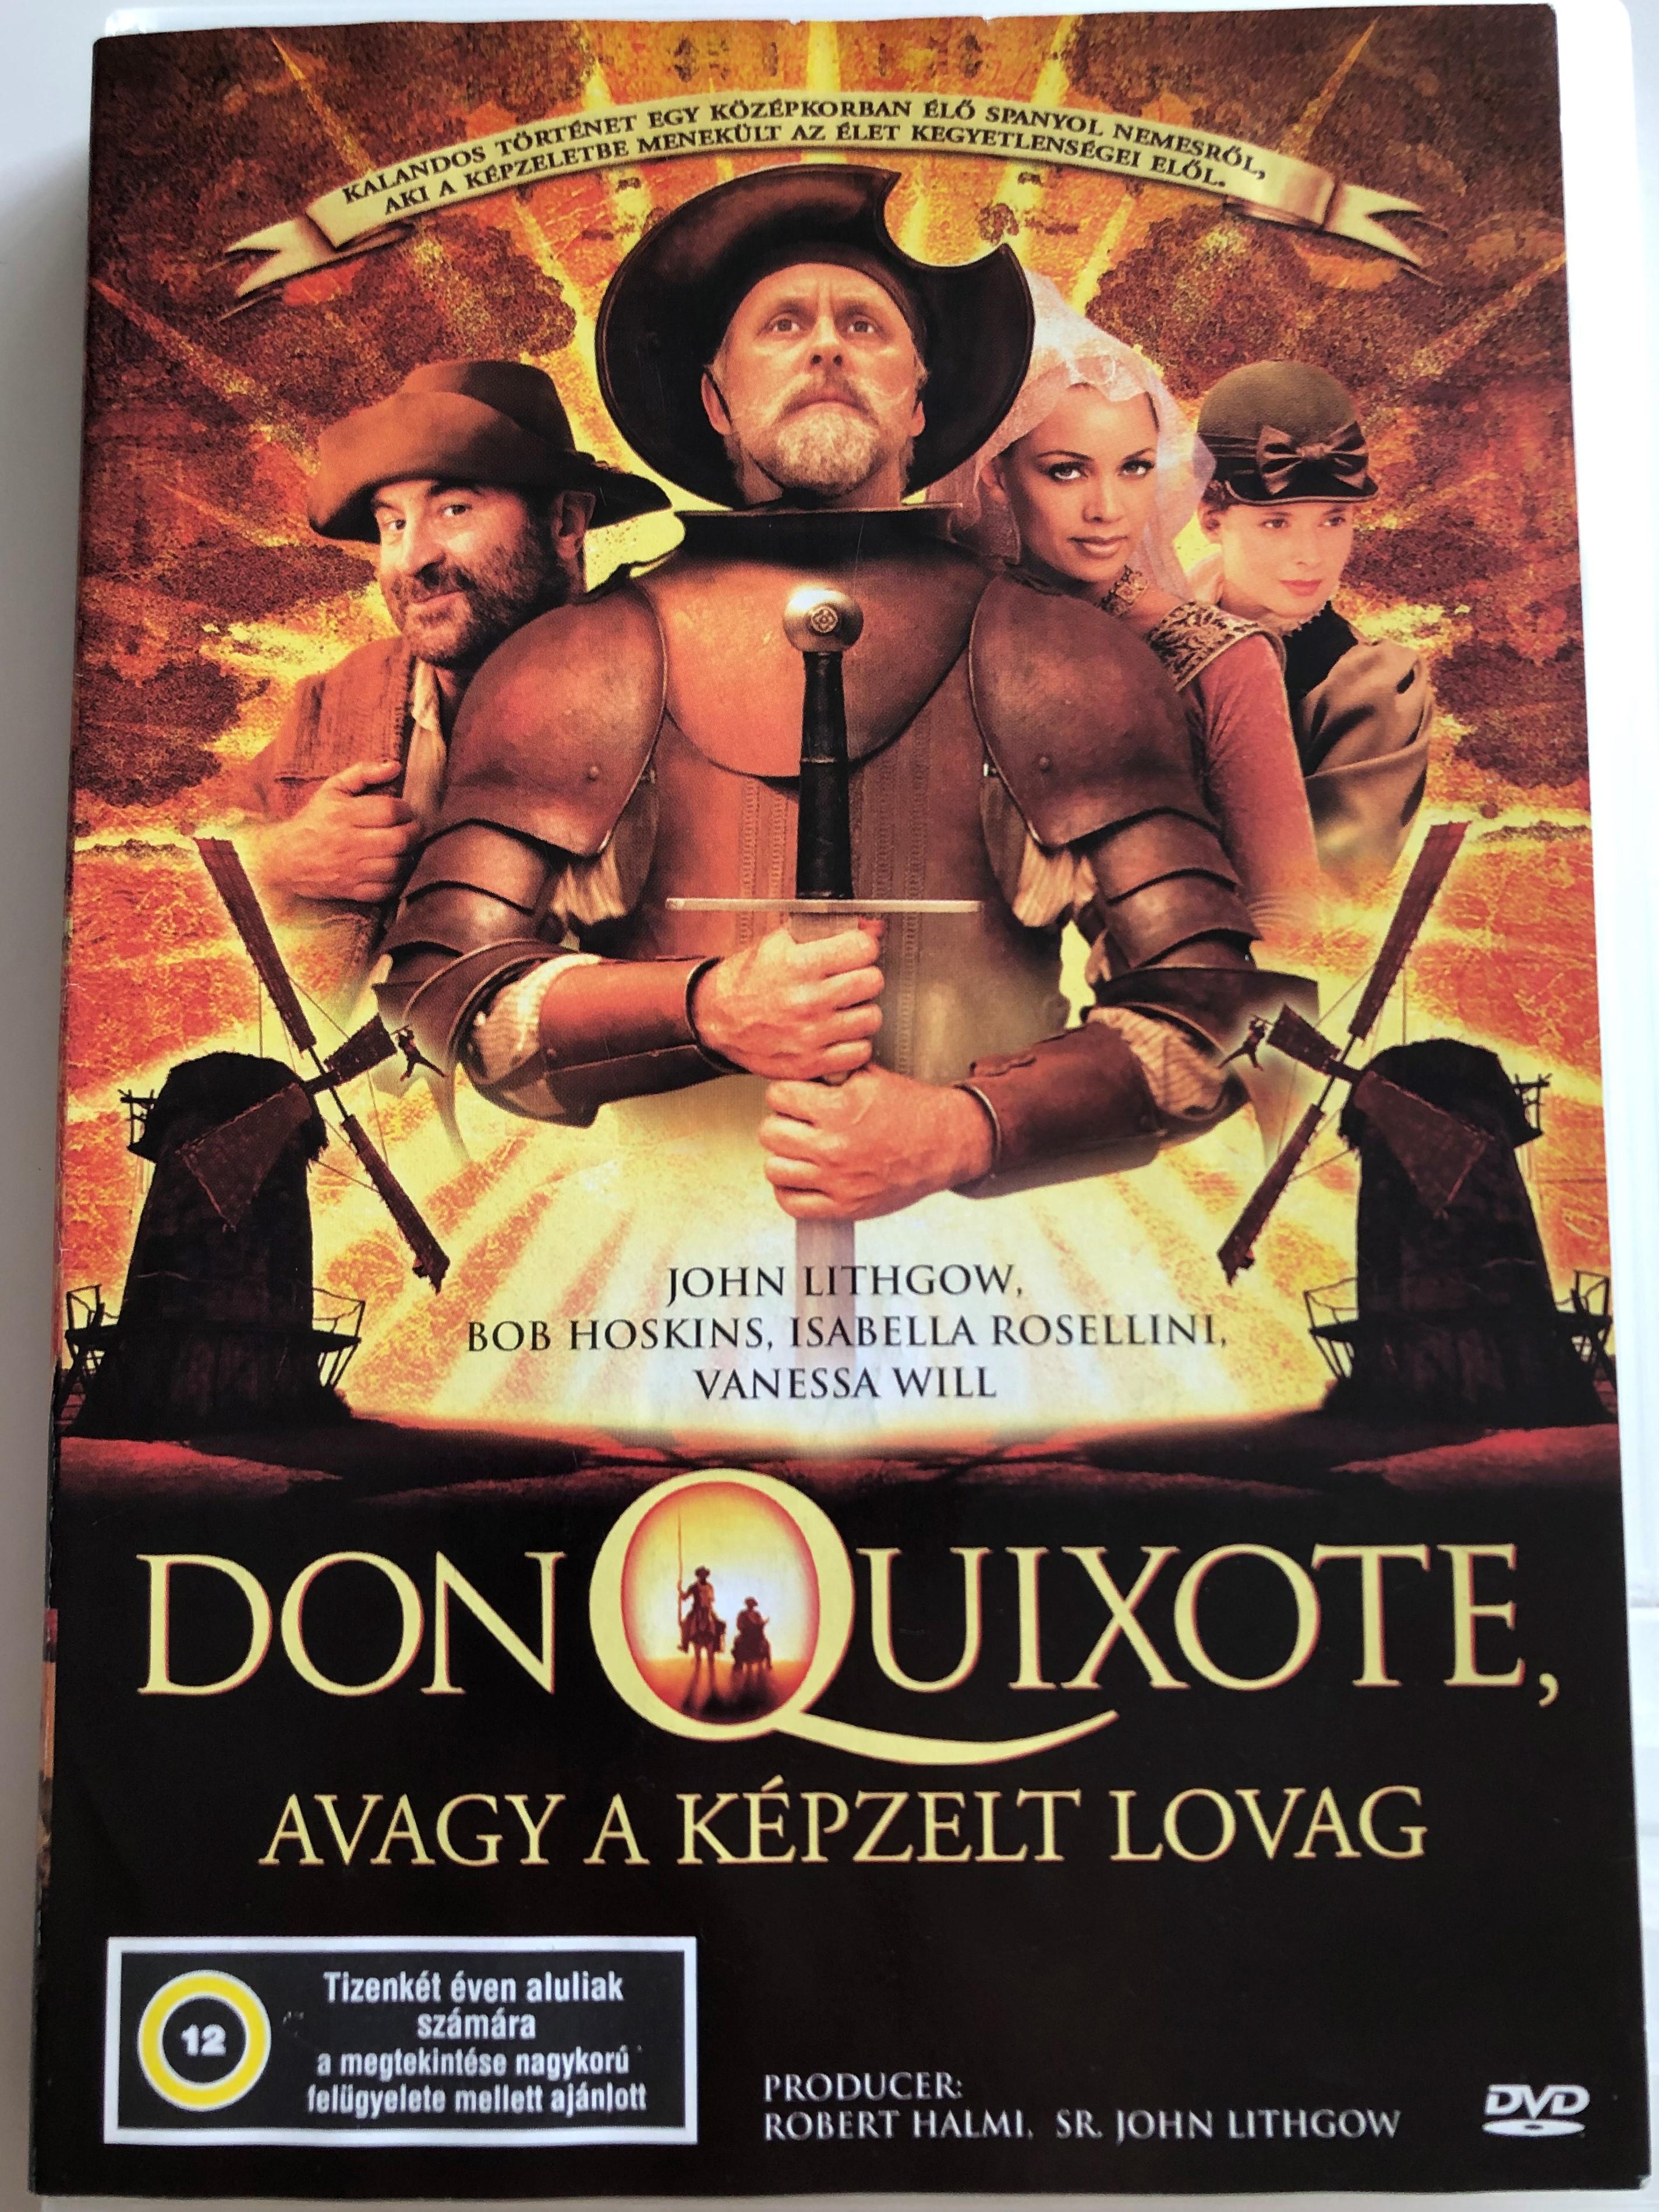 don-quixote-dvd-2000-don-quixote-avagy-a-k-pzelt-lovag-directed-by-peter-yates-starring-john-lithgow-bob-hoskins-isabella-rossellini-lambert-wilson-1-.jpg